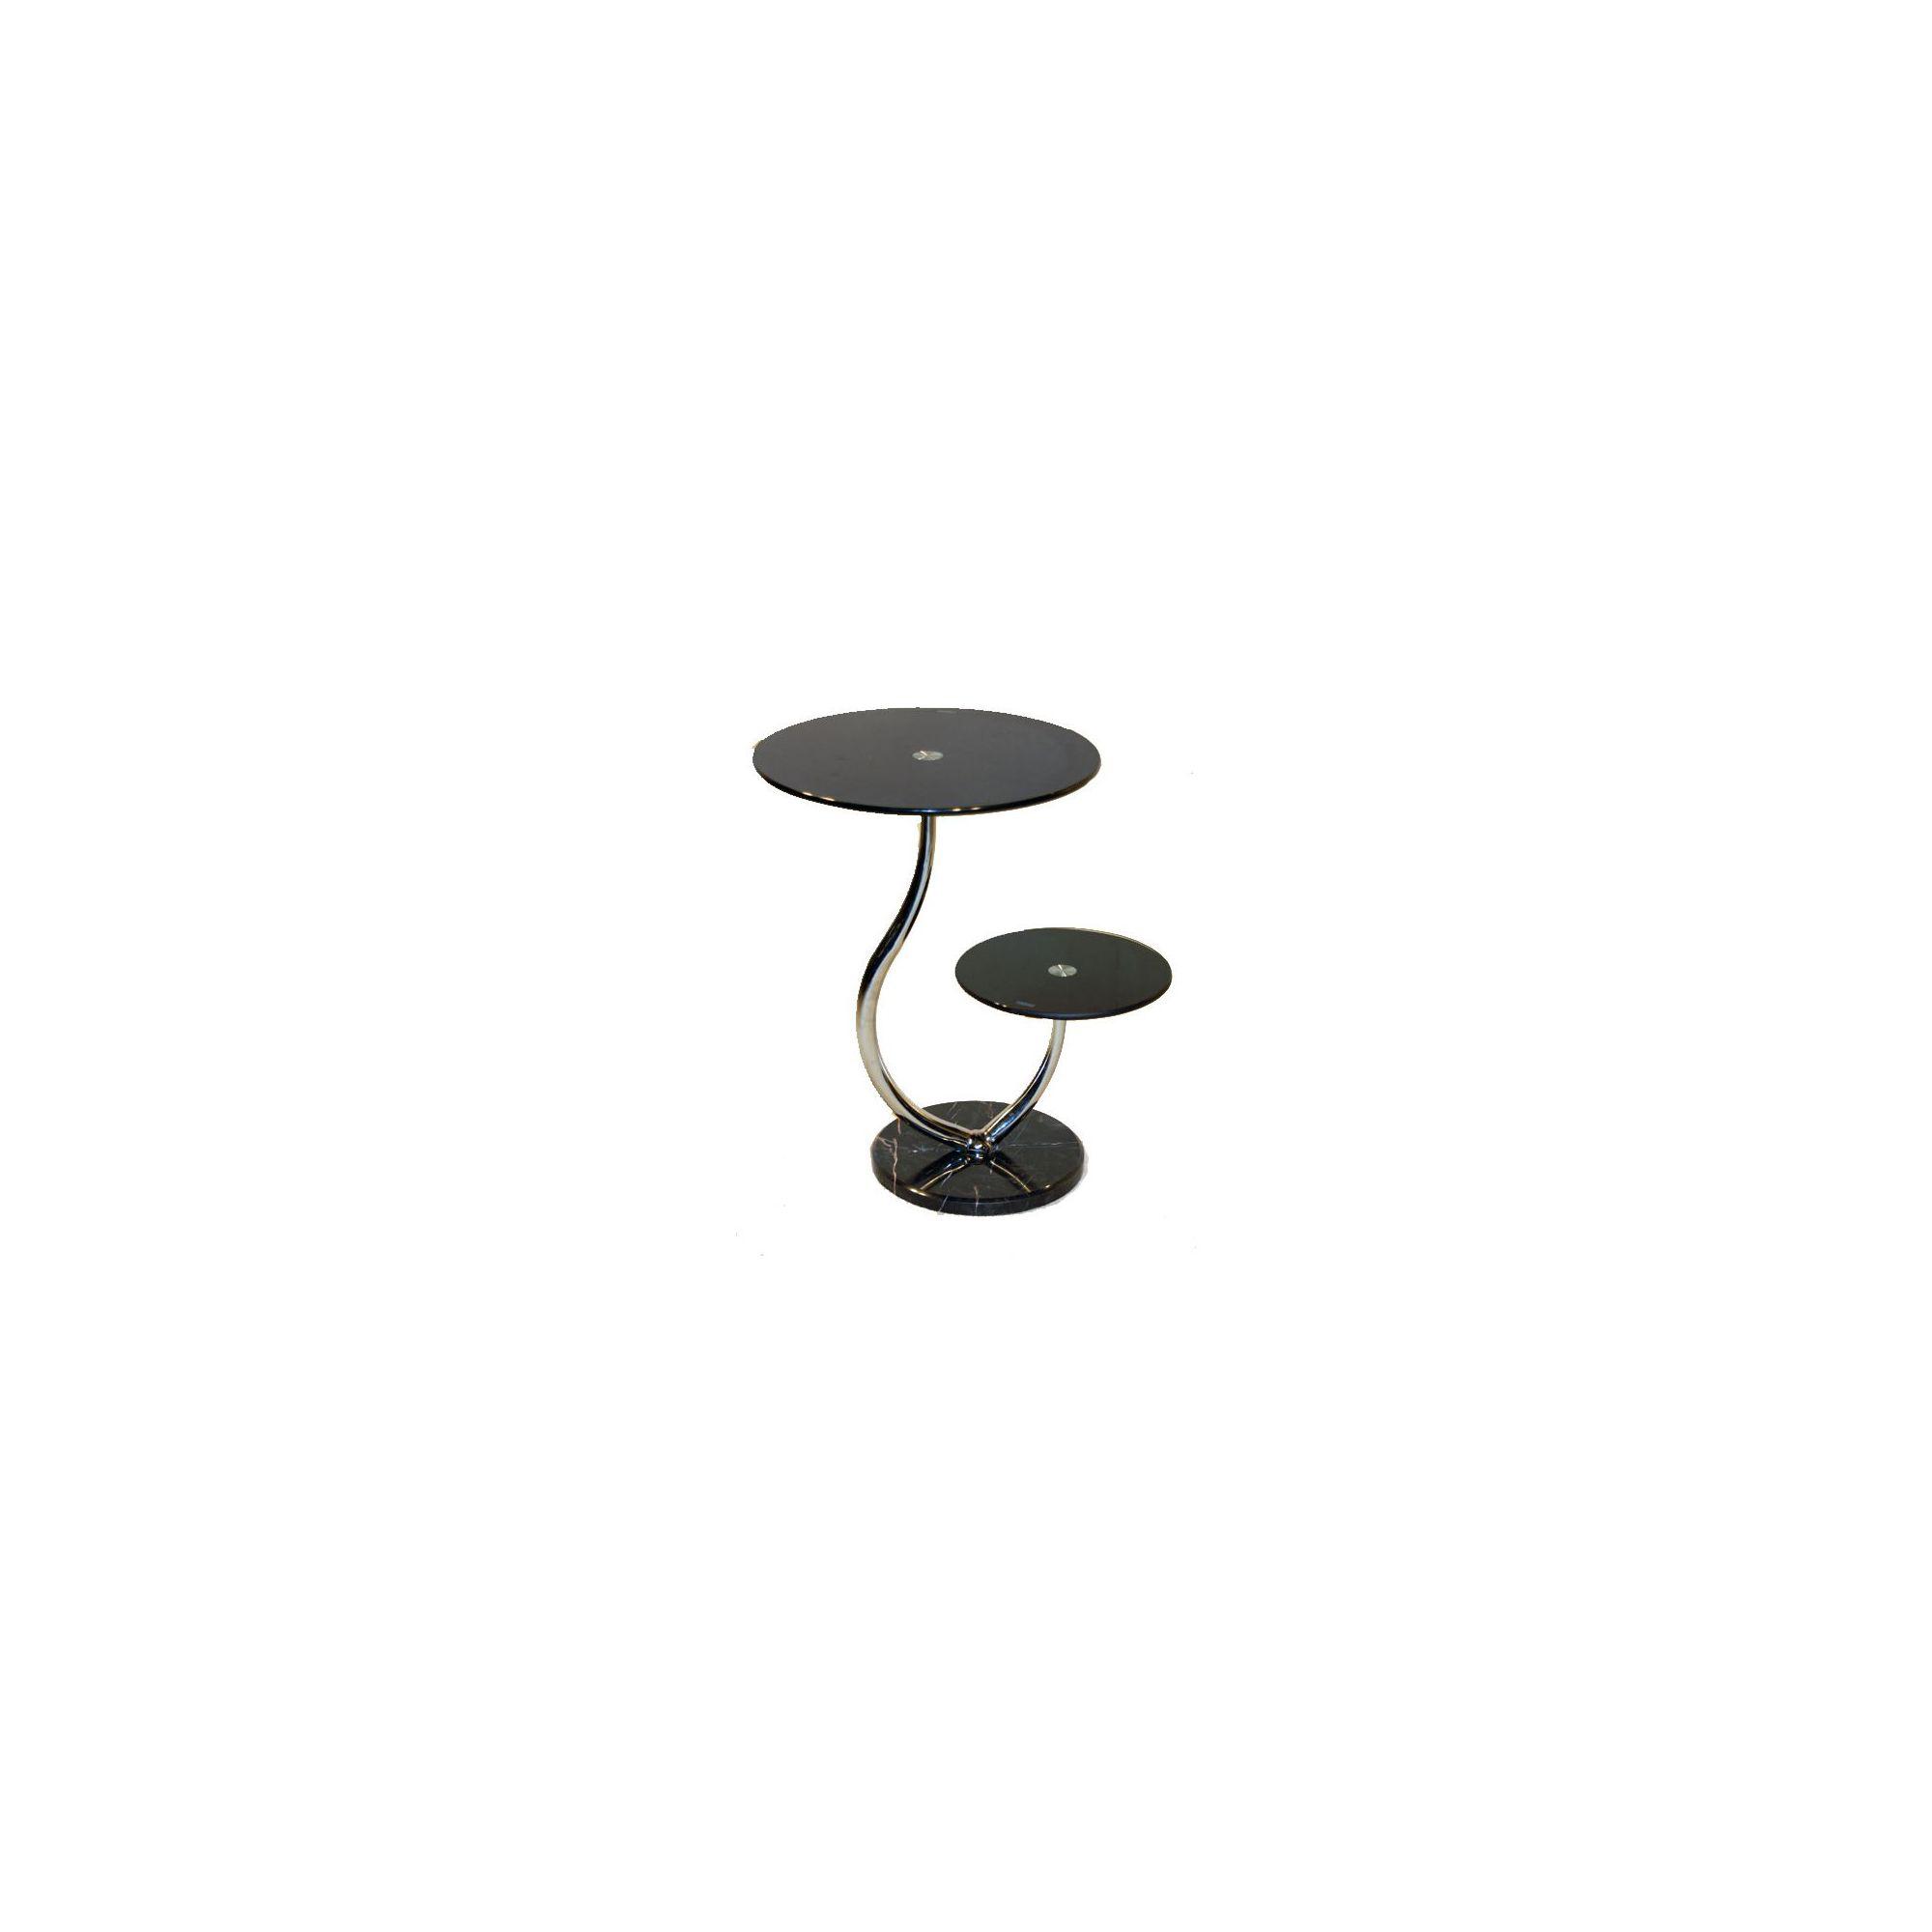 Other Set of 2 Oxshott Black Lamp Tables